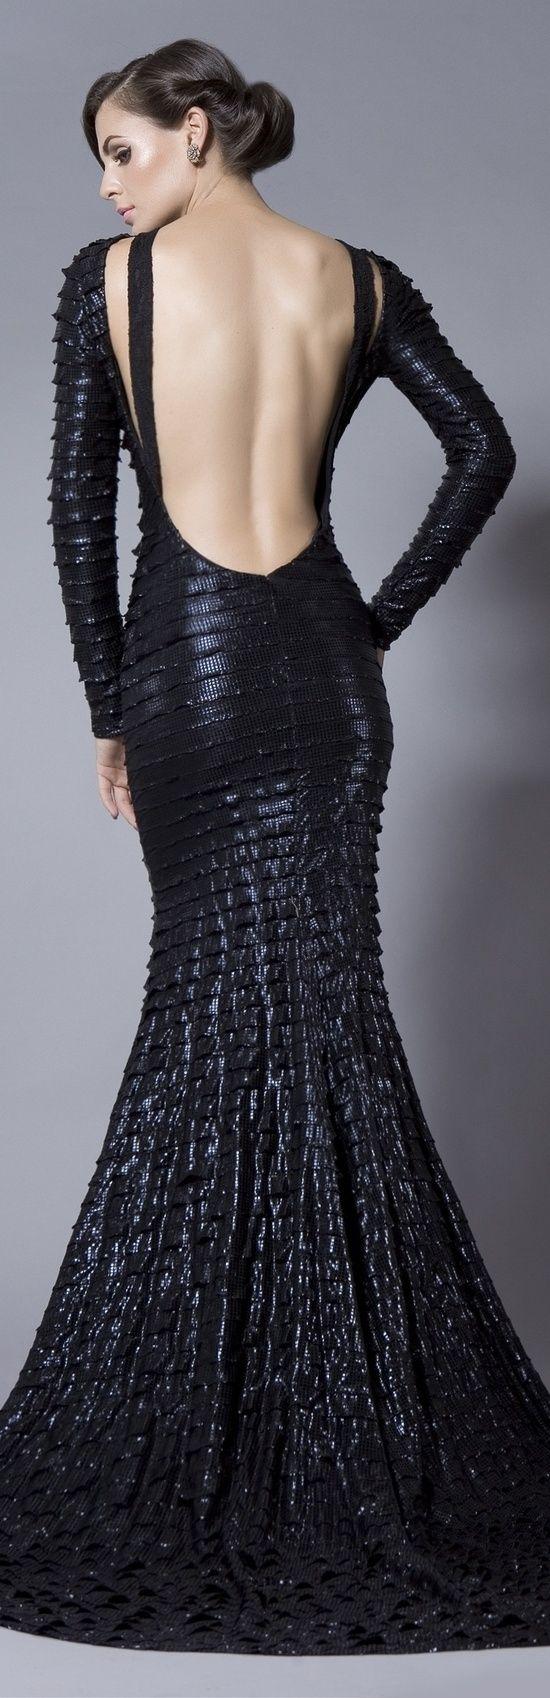 haute couture 2013/2014